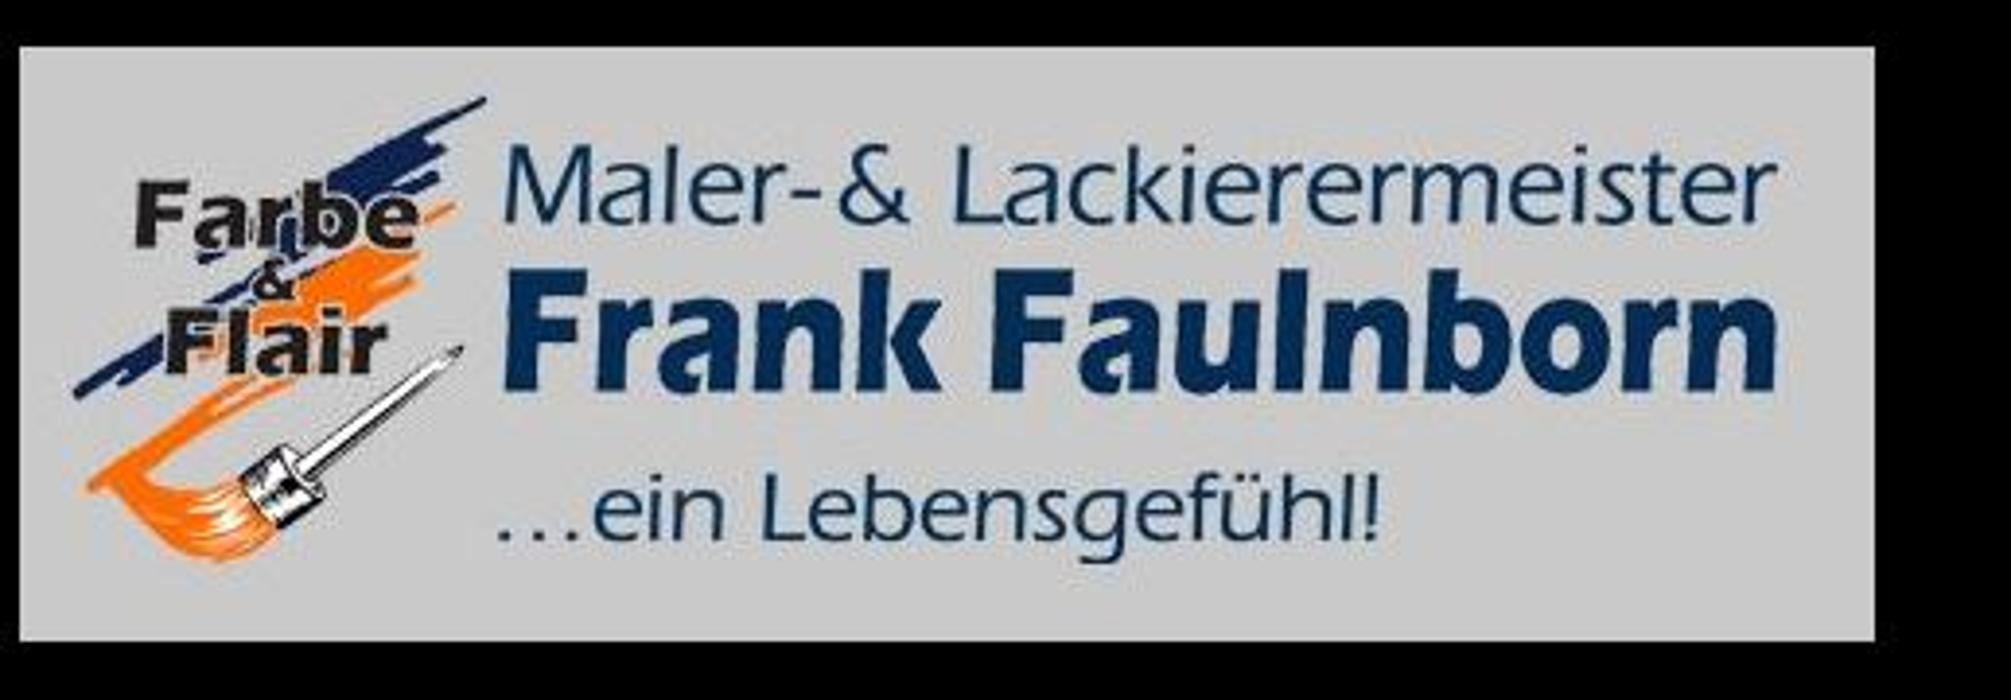 Bild zu Maler- & Lackierermeister Frank Faulnborn in Hannover